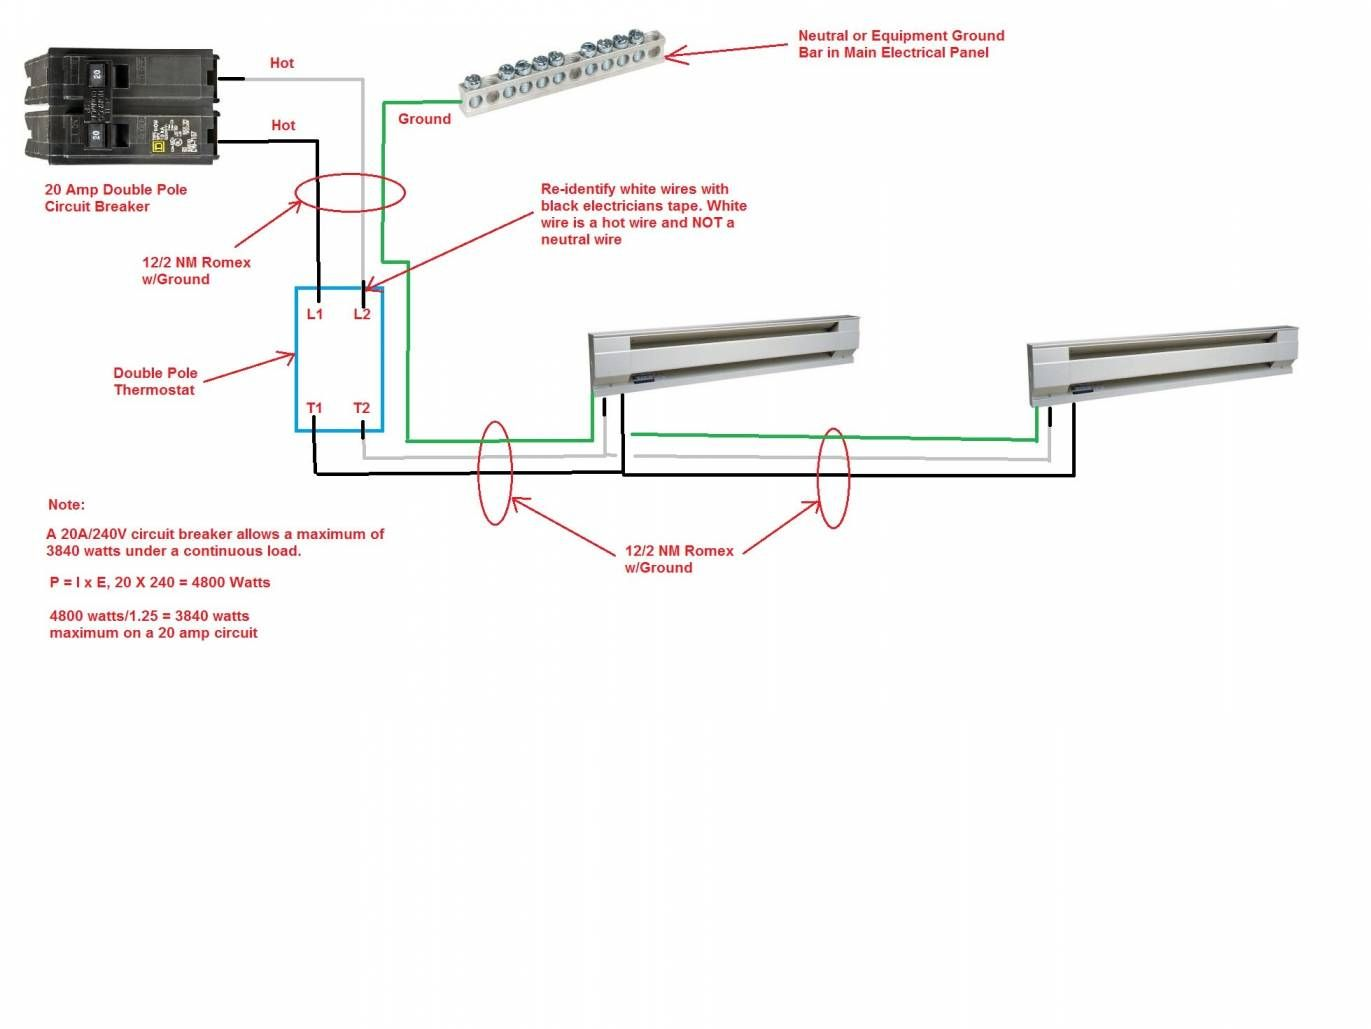 18 Power Pole Wiring Diagram Electric Baseboard Heaters Baseboard Heater Thermostat Wiring